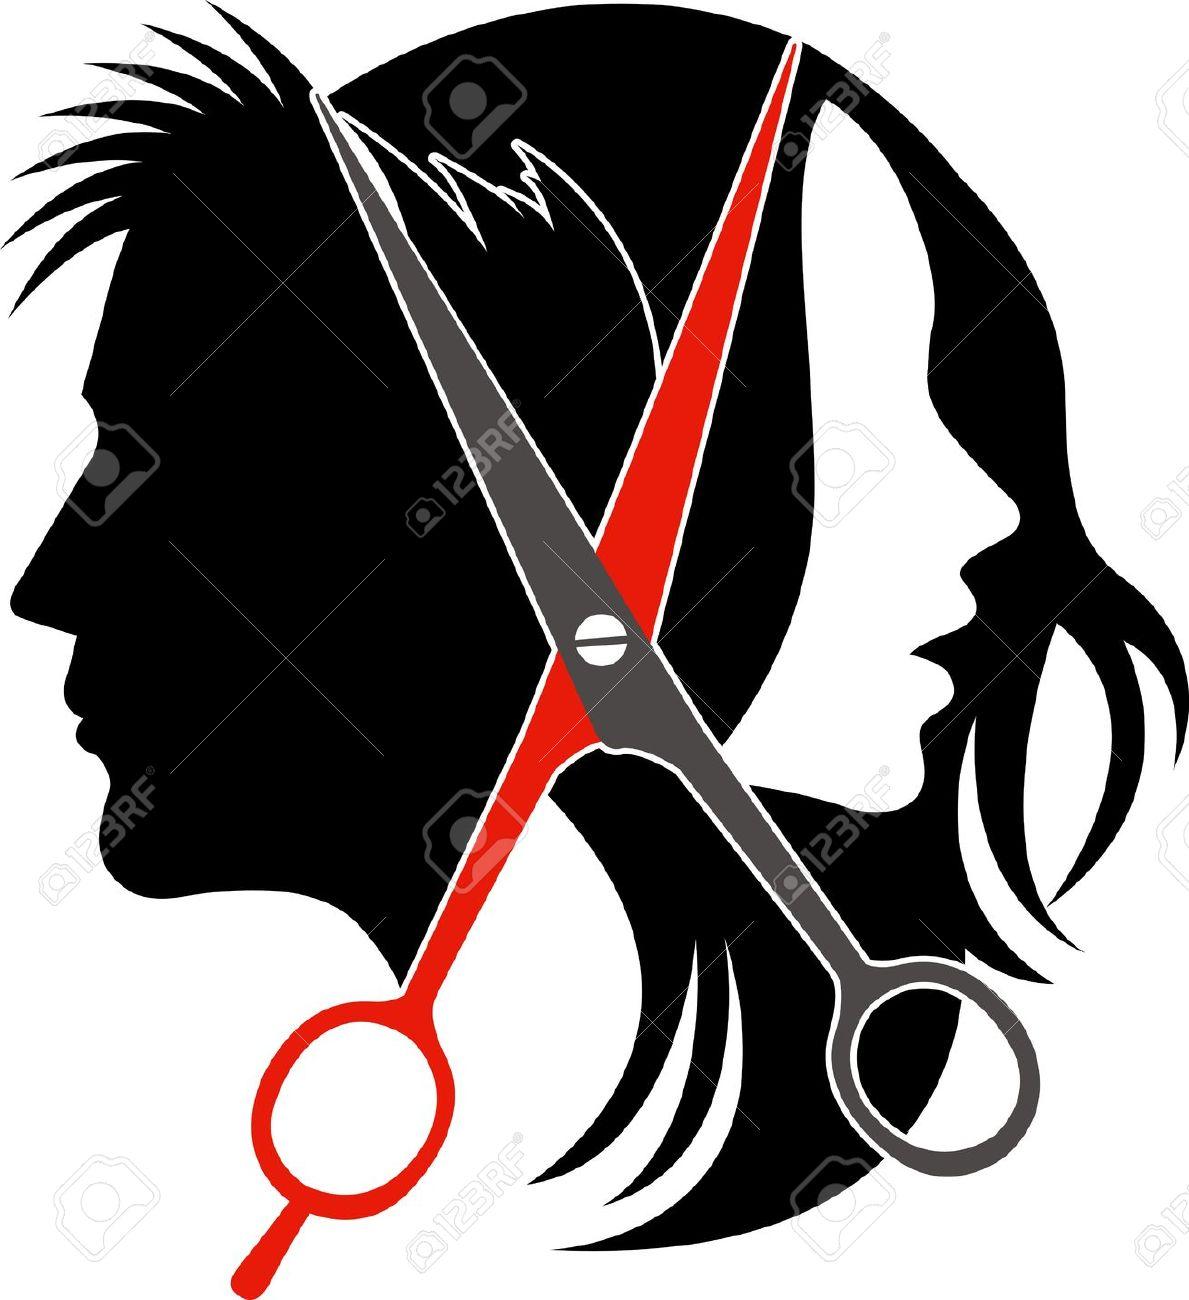 Hair Salon: Illustration Art Of Salon Co-hair salon: Illustration art of salon concept on isolated background Illustration-8